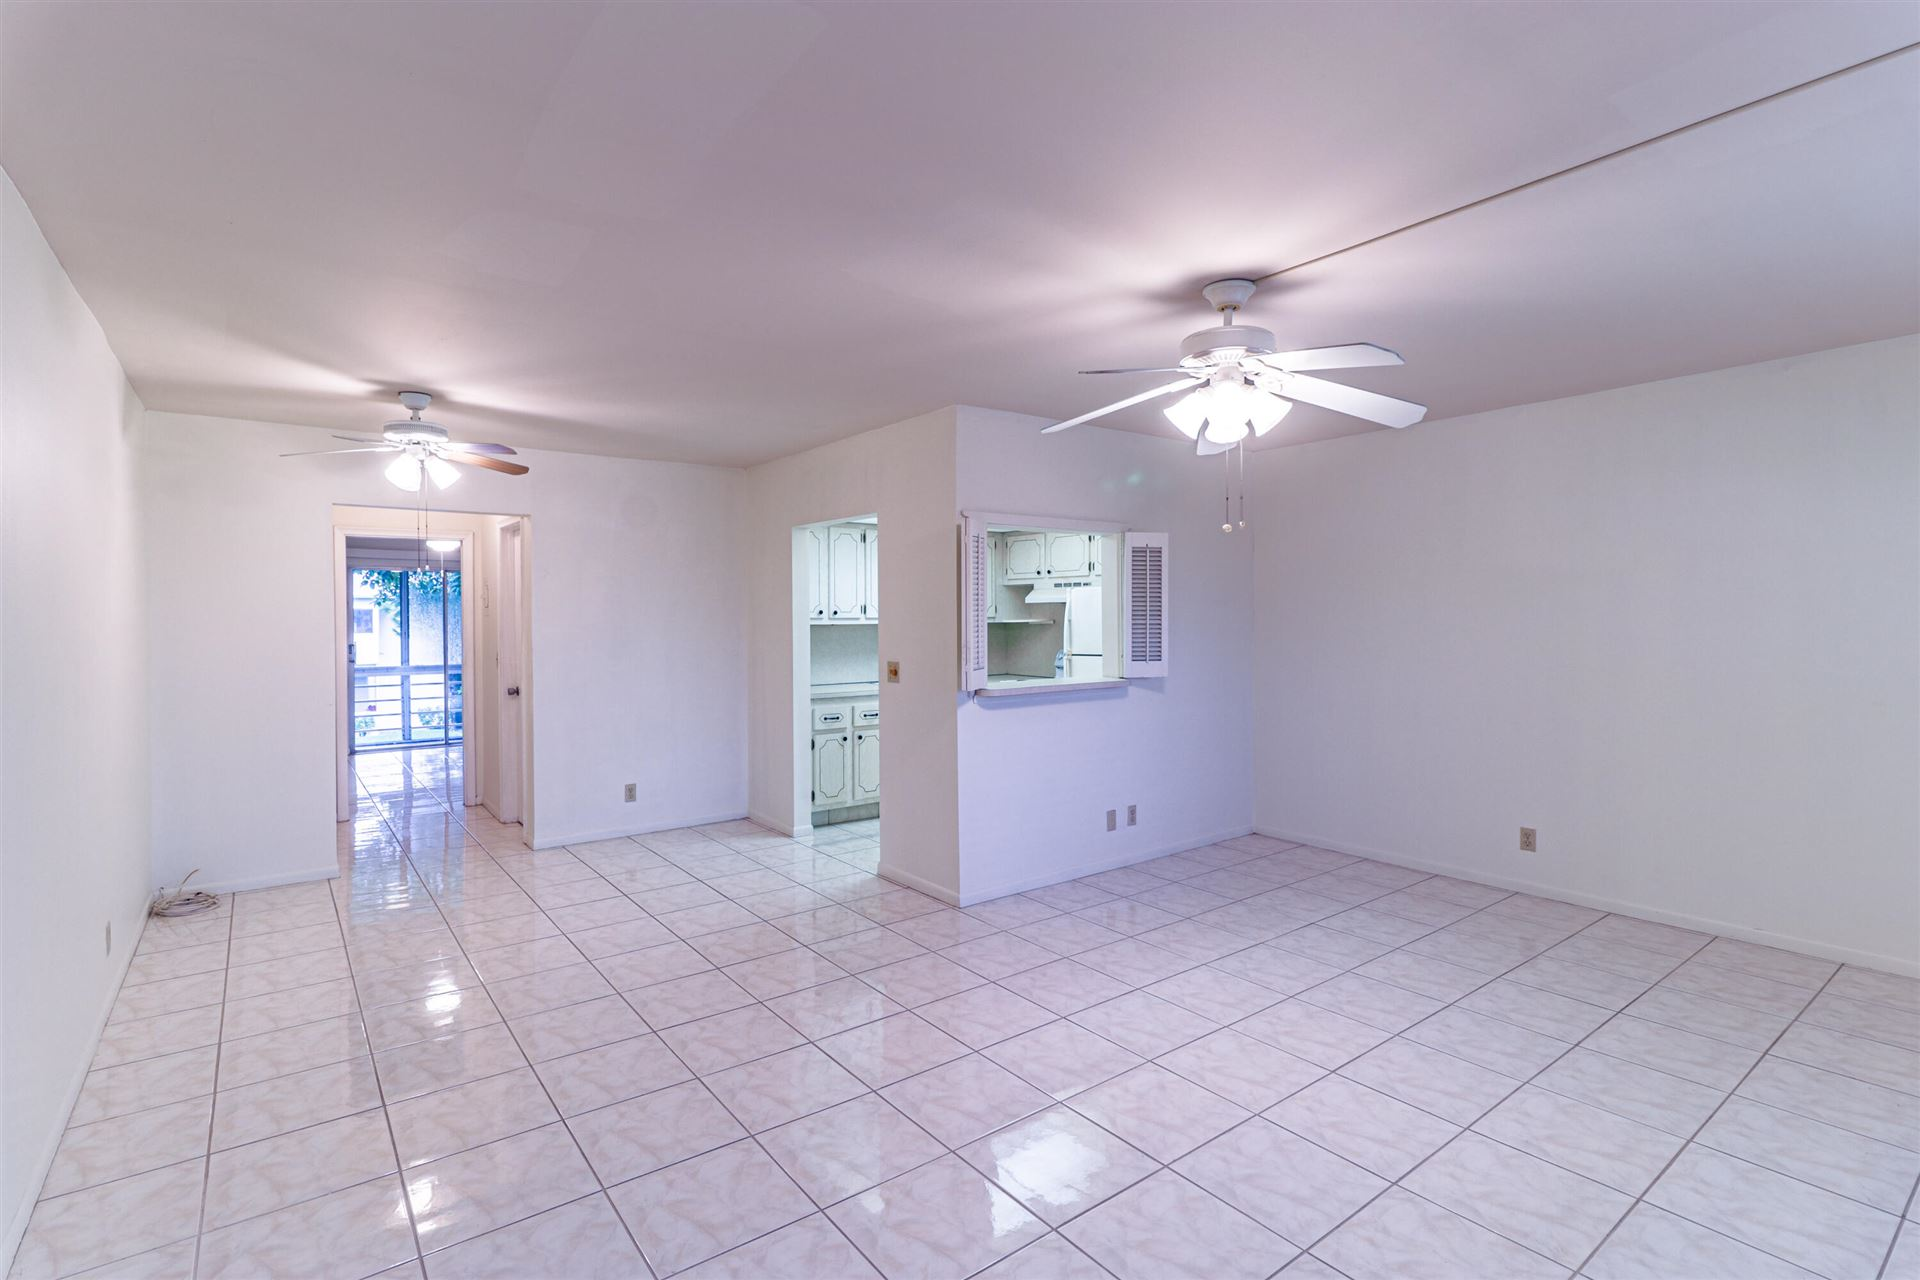 Photo of 62 Norwich C, West Palm Beach, FL 33417 (MLS # RX-10747330)